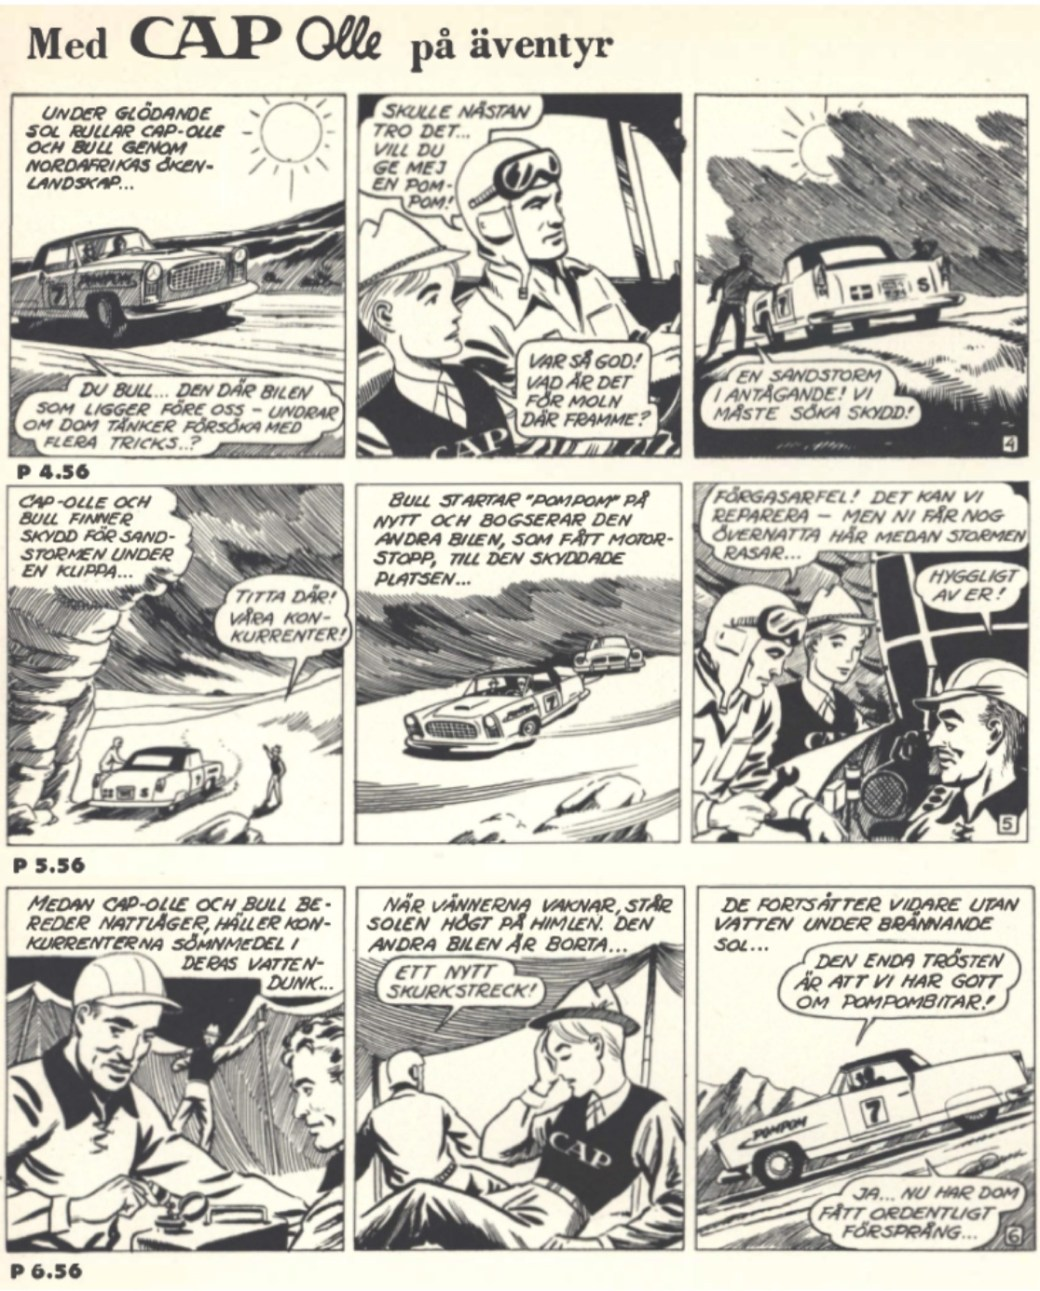 Några strippar av Eugen Semitjov ur annonsserien CAP-Olle på äventyr